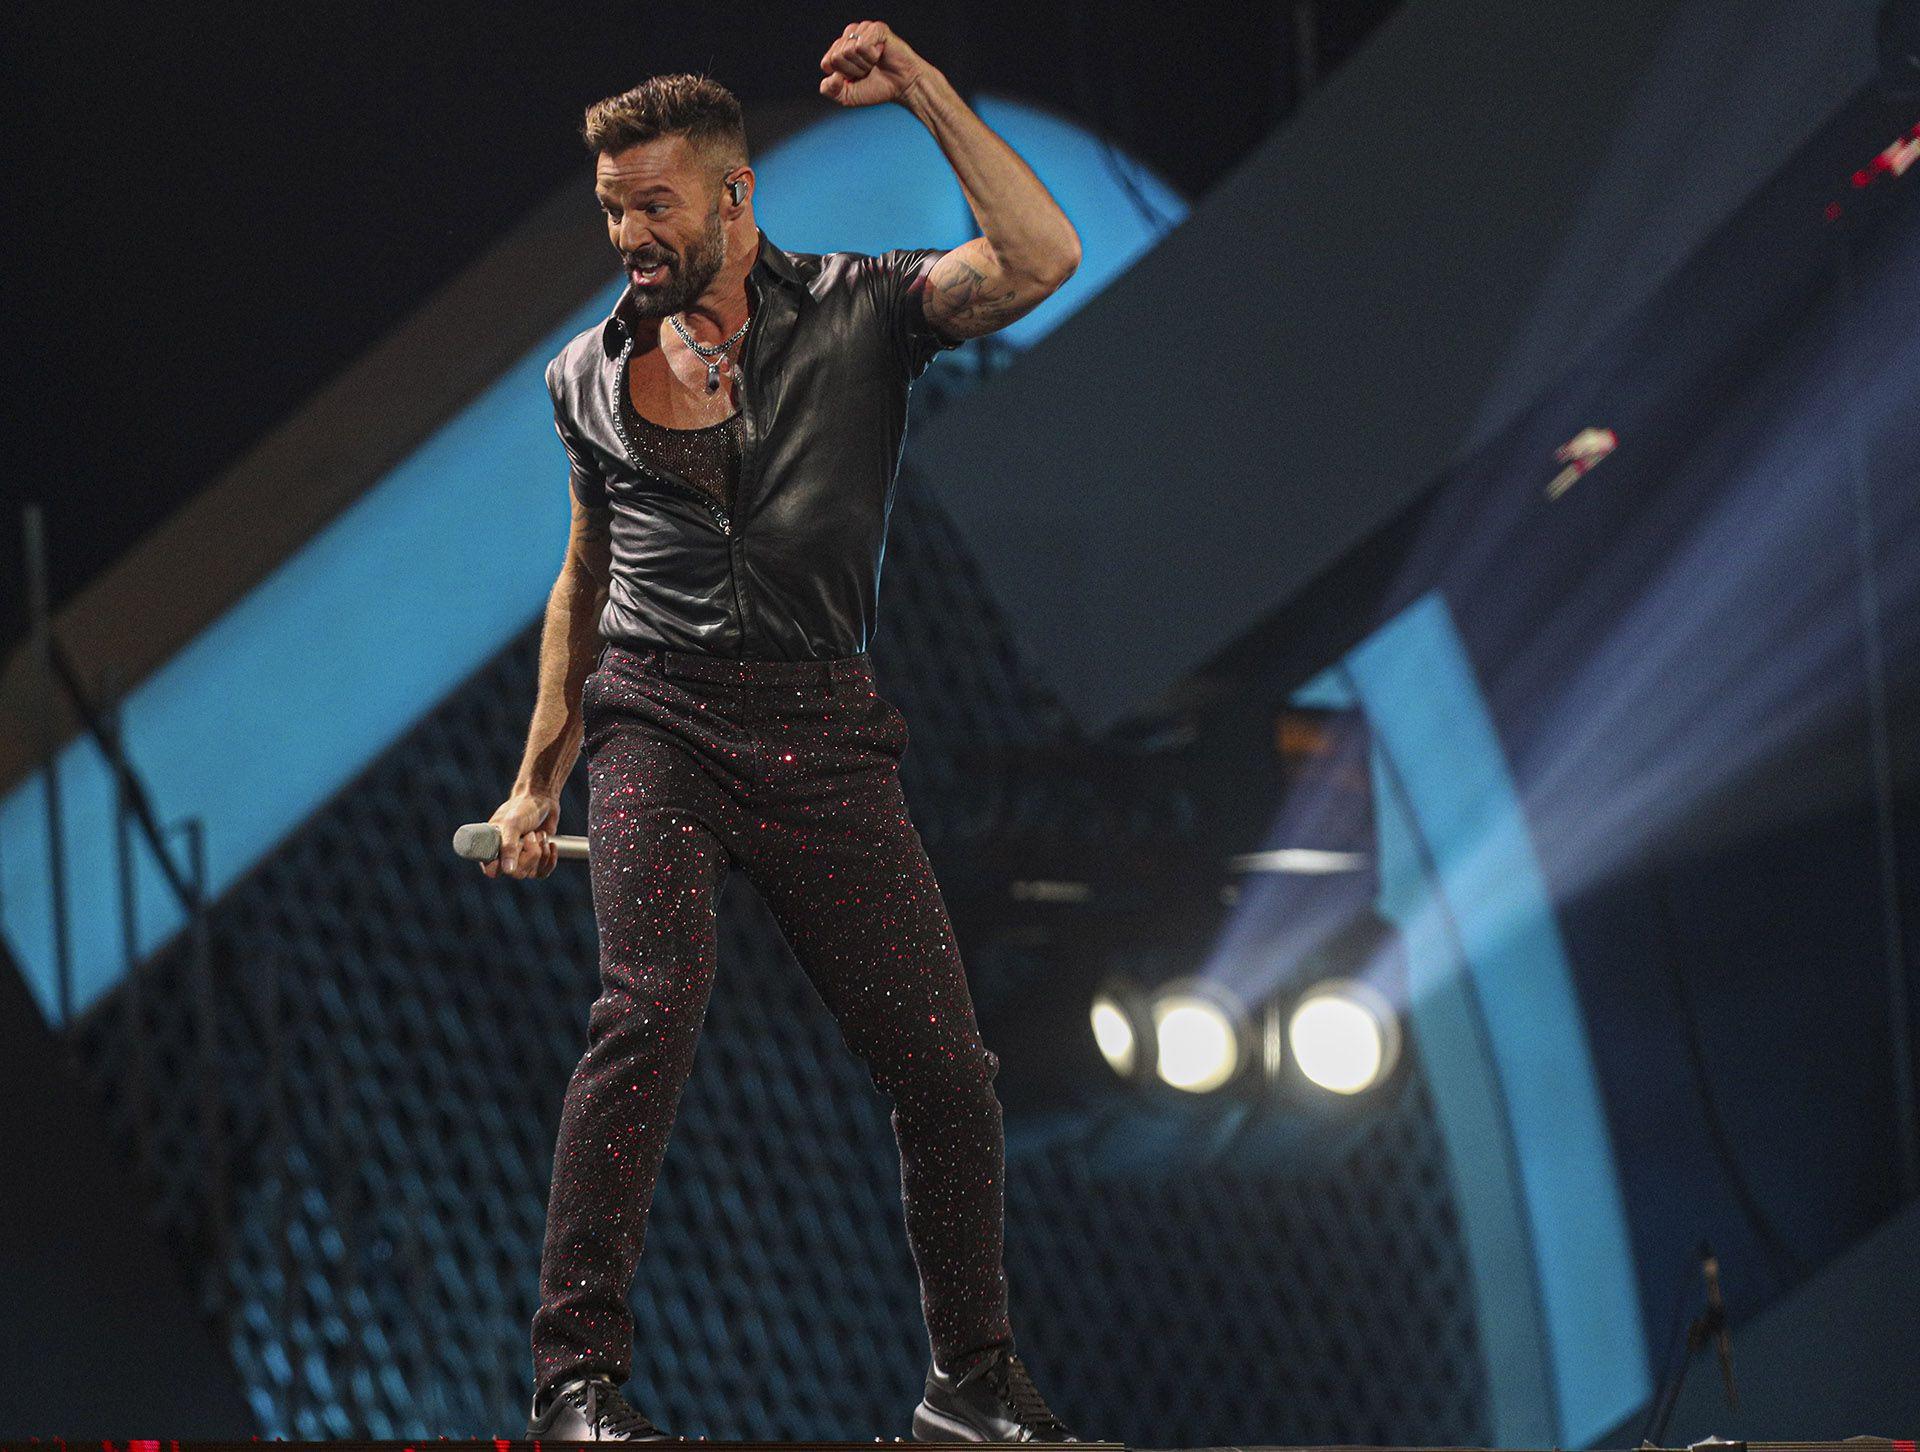 Ricky Martin, en plena acción en Viña del Mar (Foto: AP / Esteban Felix)